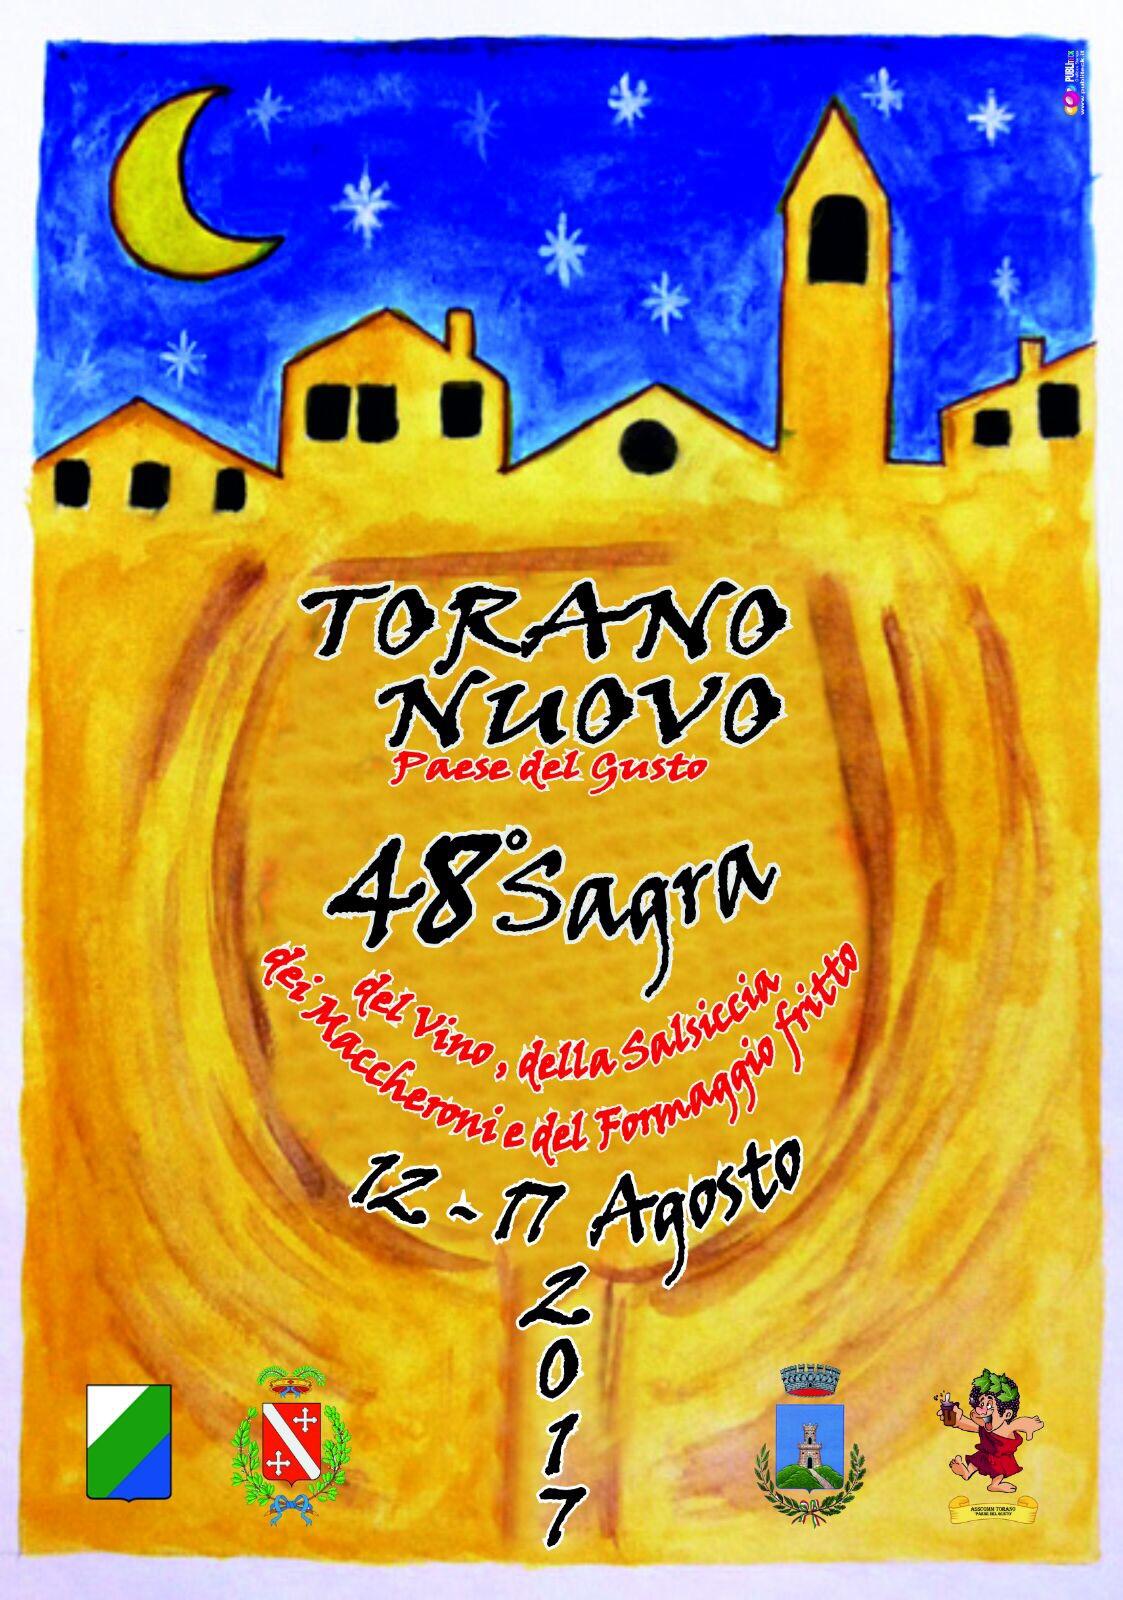 48^ Sagra Torano Nuovo 12 - 17 Agosto 2017